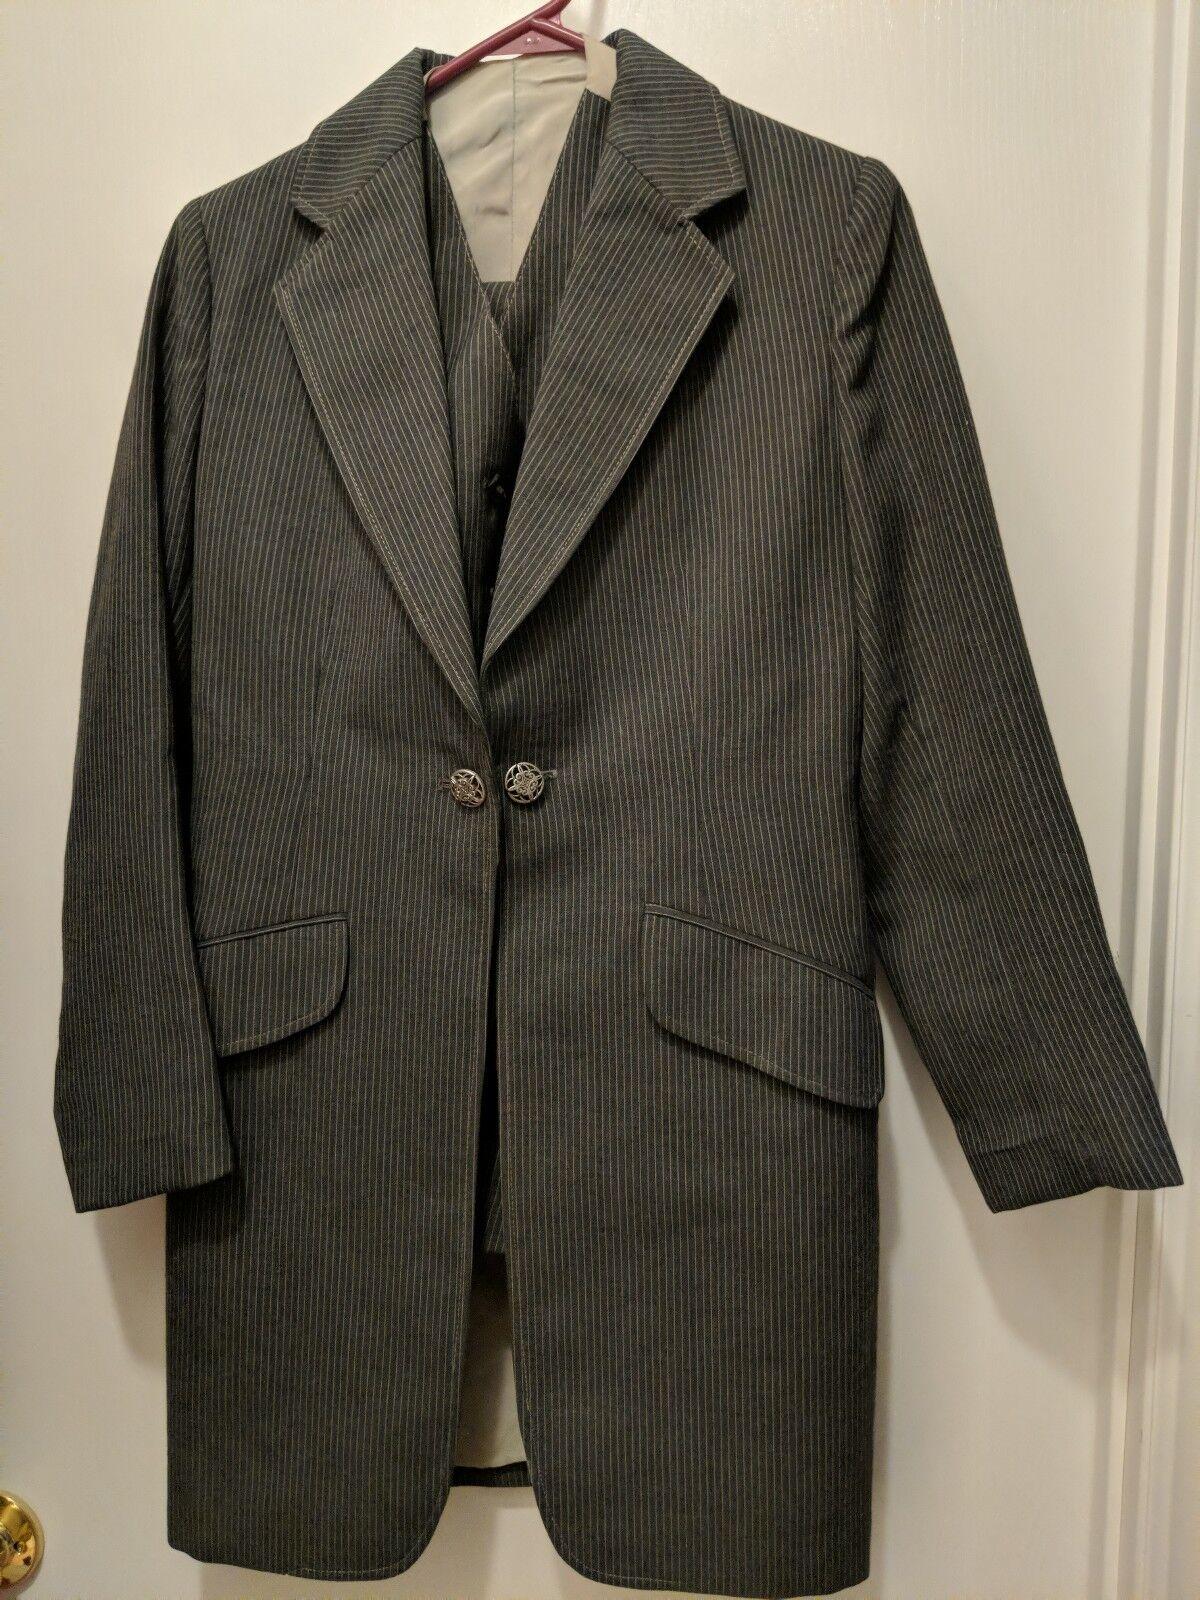 Grey  3 piece SaddleSeat pin Strip suit Great condition   sz 10R  authentic online